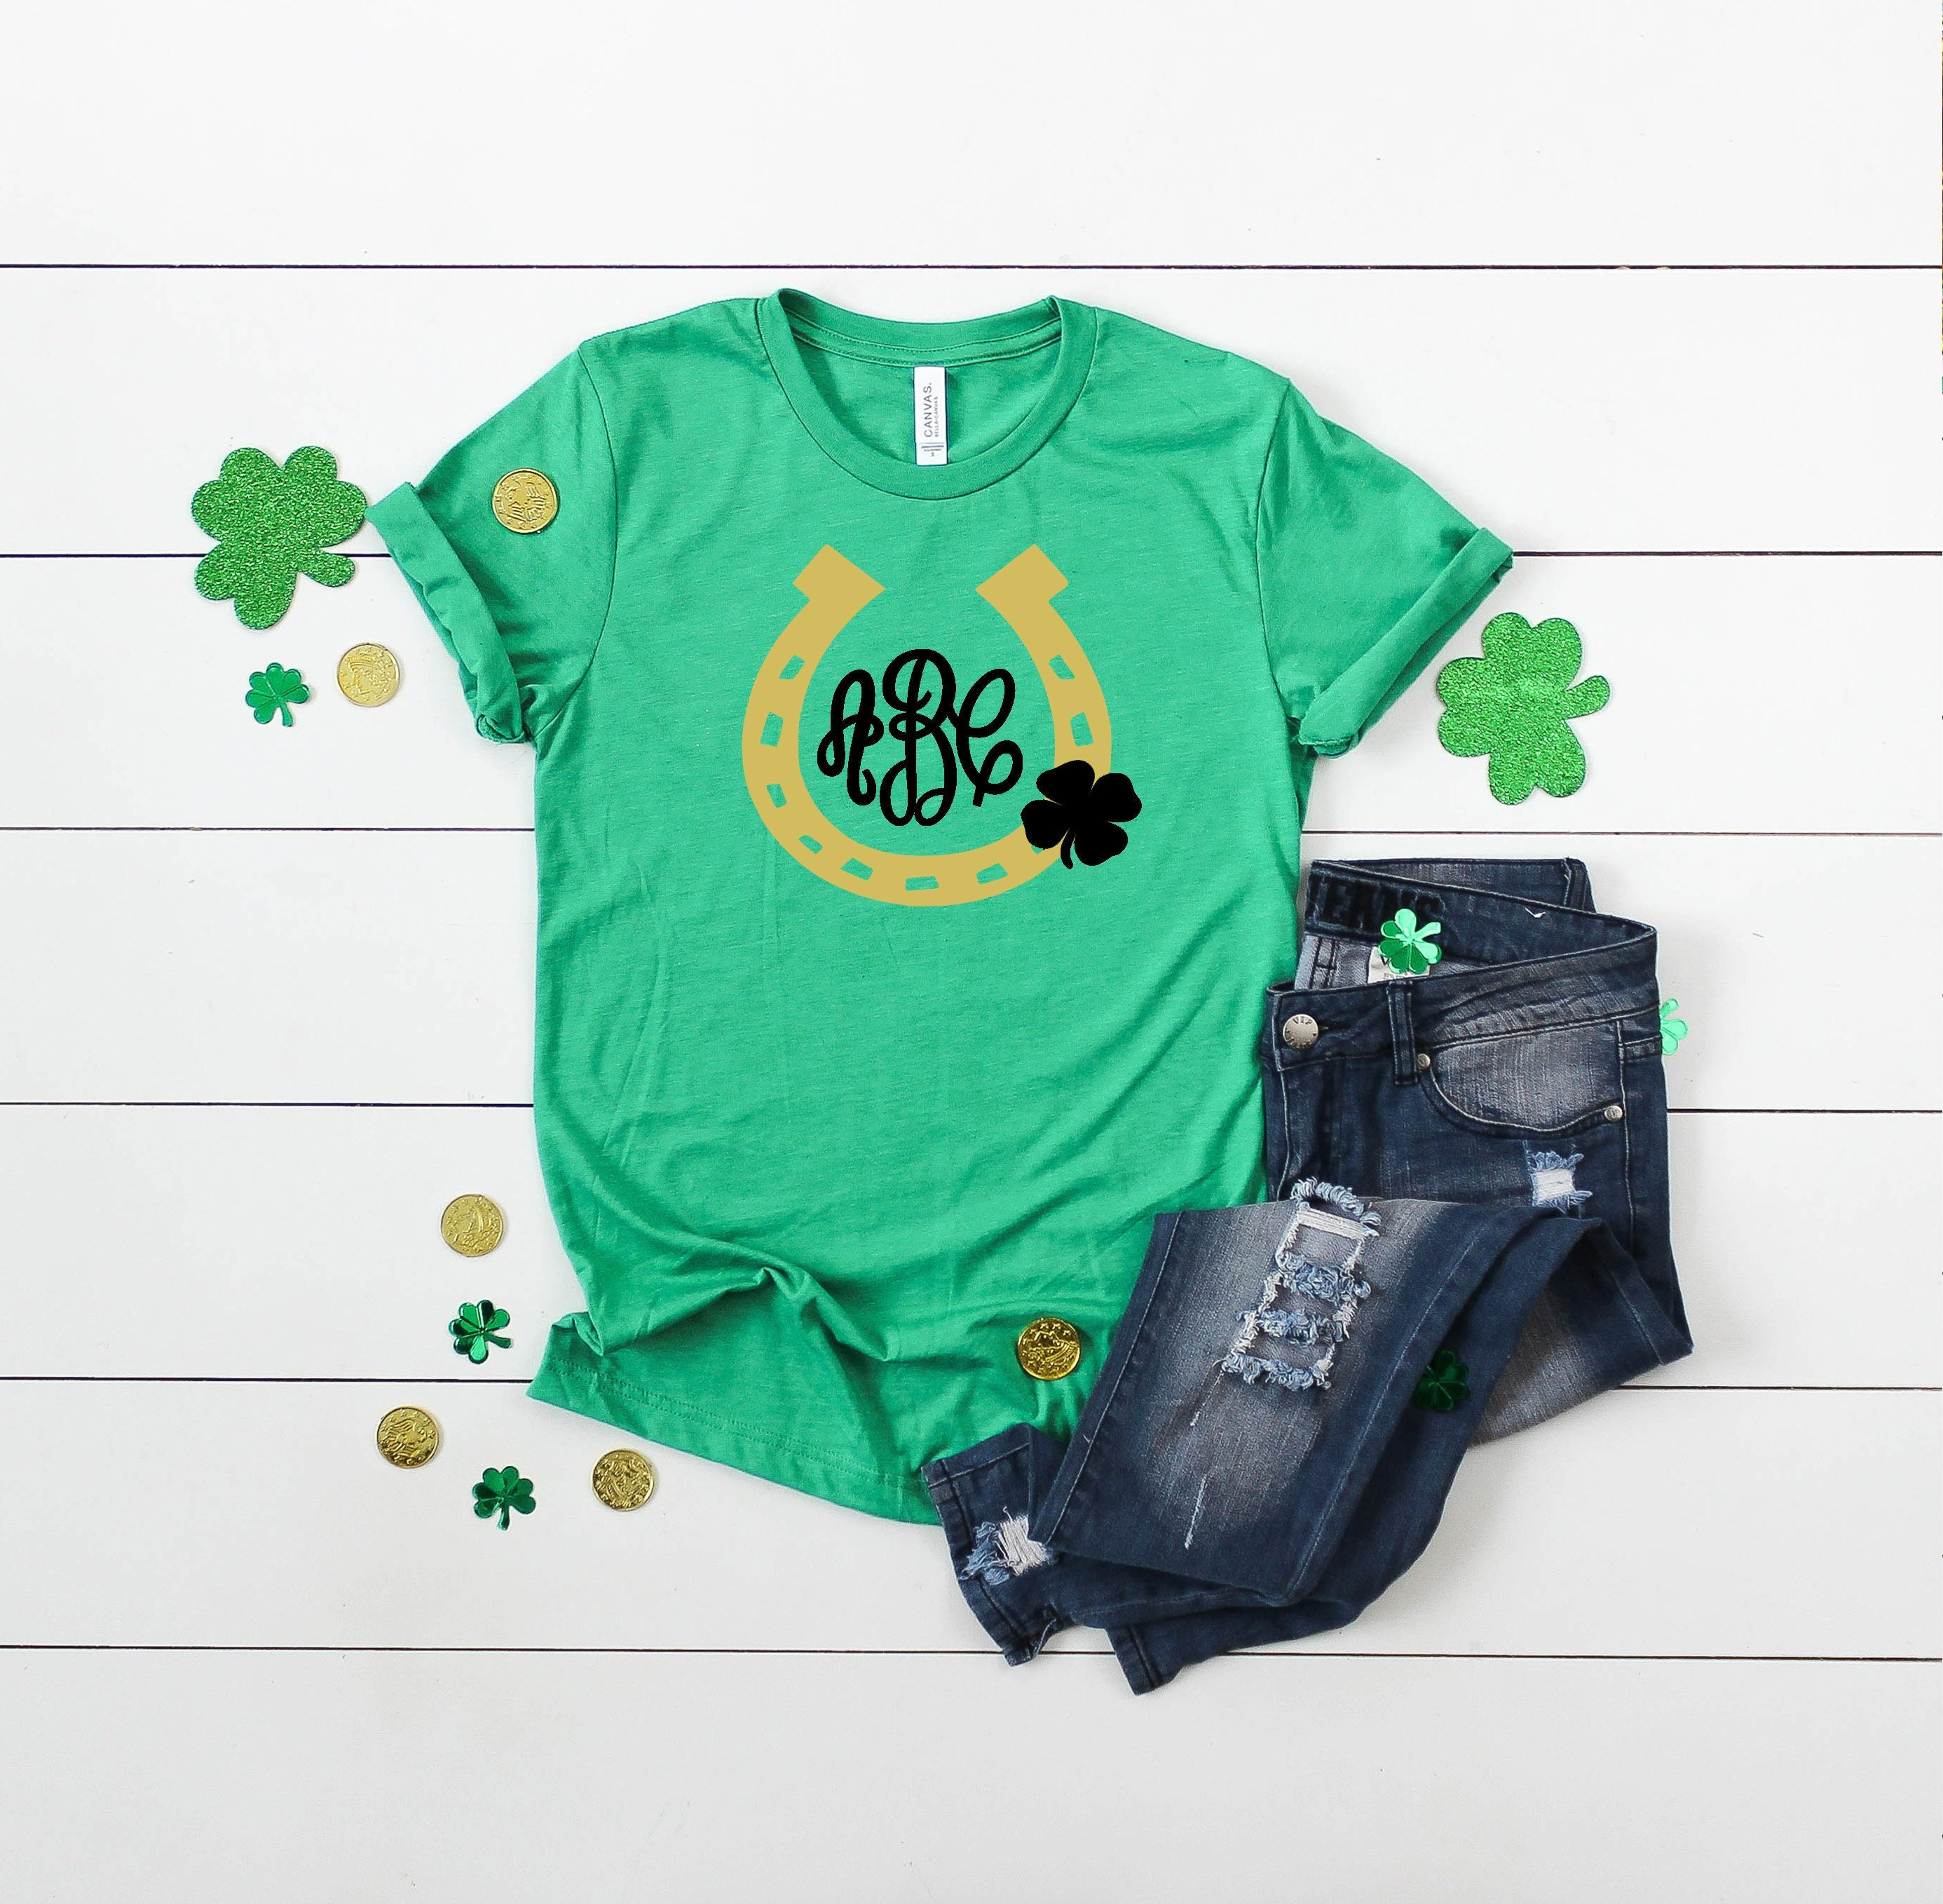 a57fc4c2e Monogram Horseshoe St. Patrick's Day Short Sleeved Shirt ...